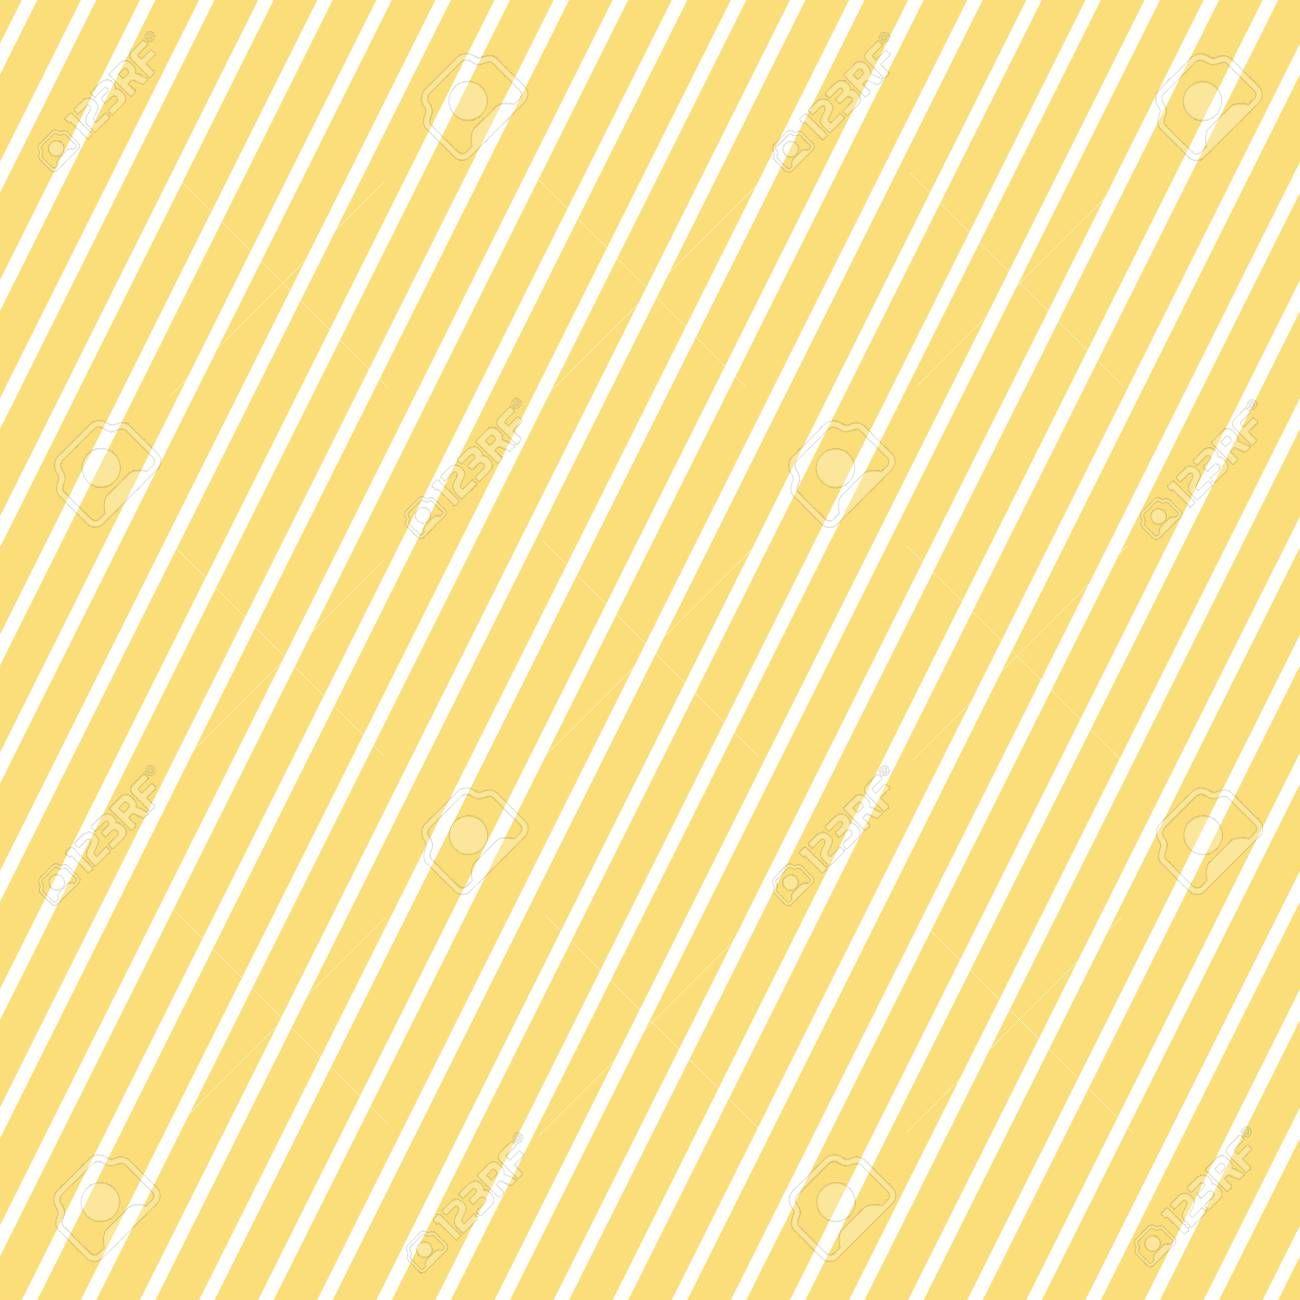 Diagonal Stripes Pattern Geometric Simple Background Creative And Elegant Style Illustration Spo In 2020 Diagonal Stripes Pattern Stripes Pattern Simple Backgrounds